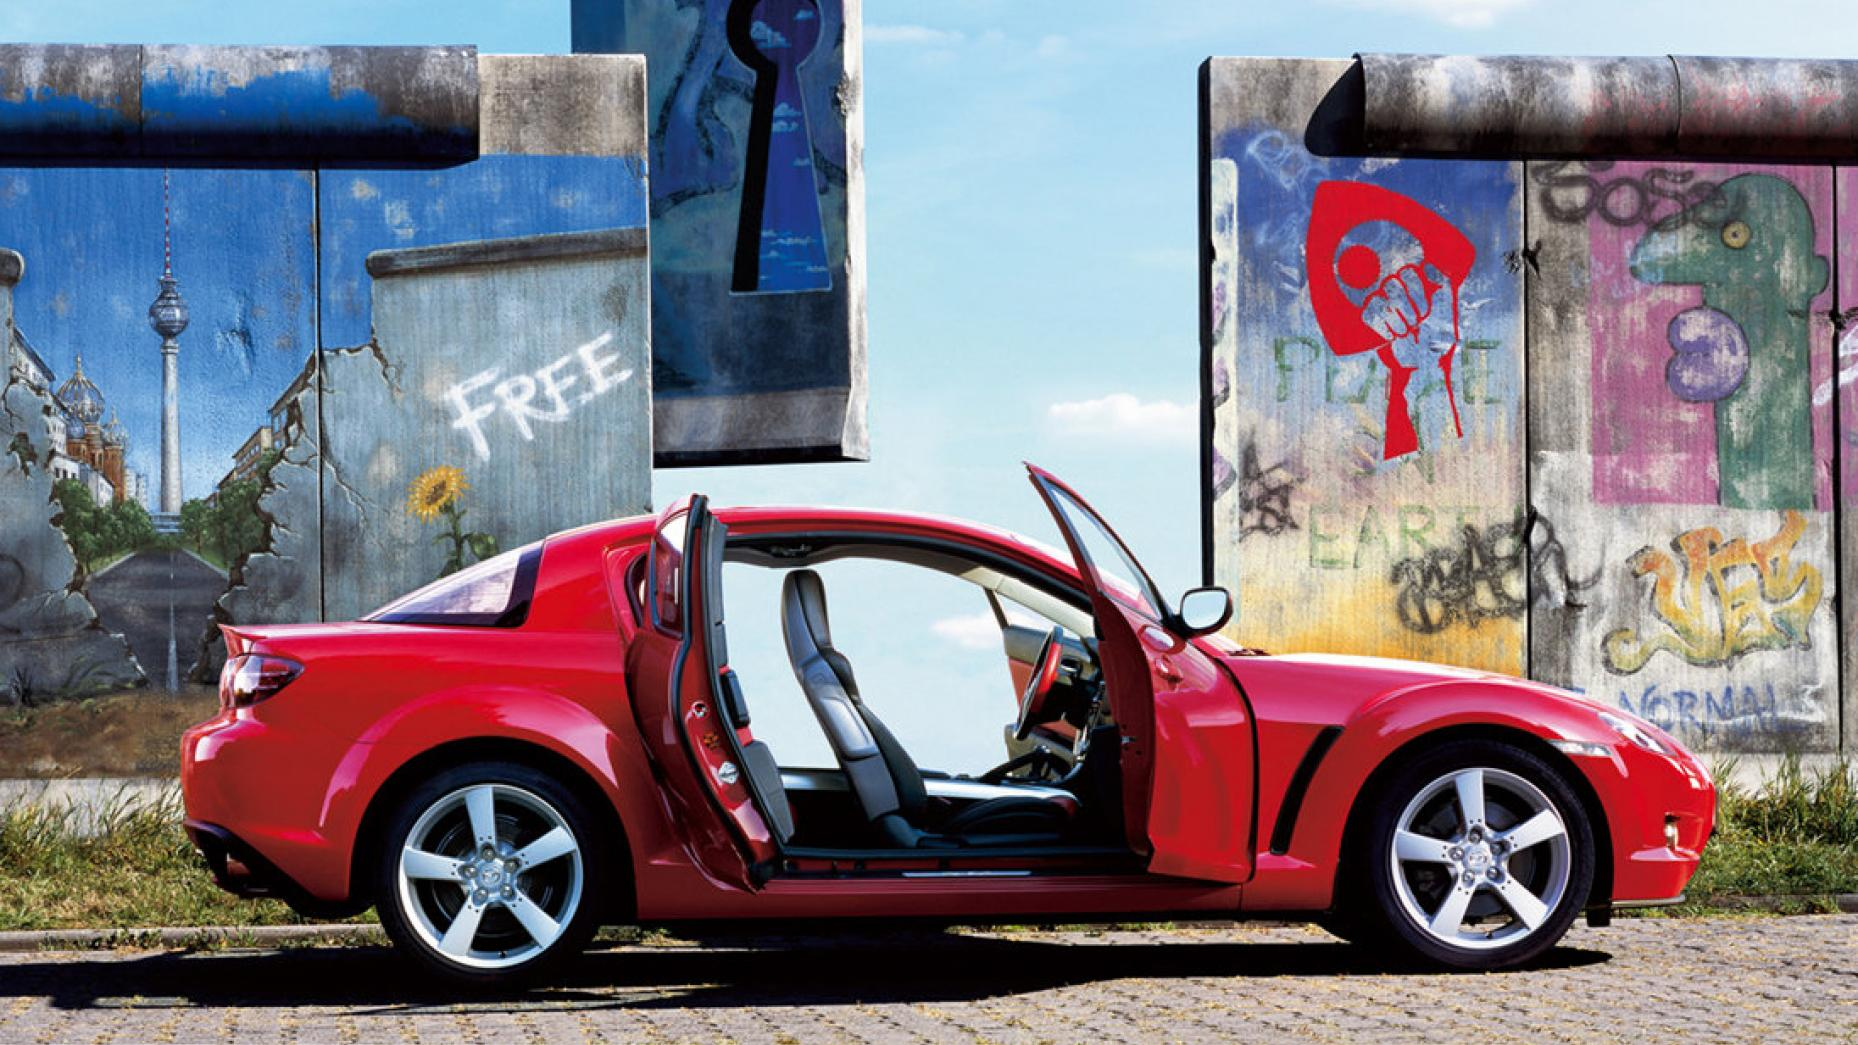 10 buitengewone autogadgets die echt bestaan topgear nederland. Black Bedroom Furniture Sets. Home Design Ideas